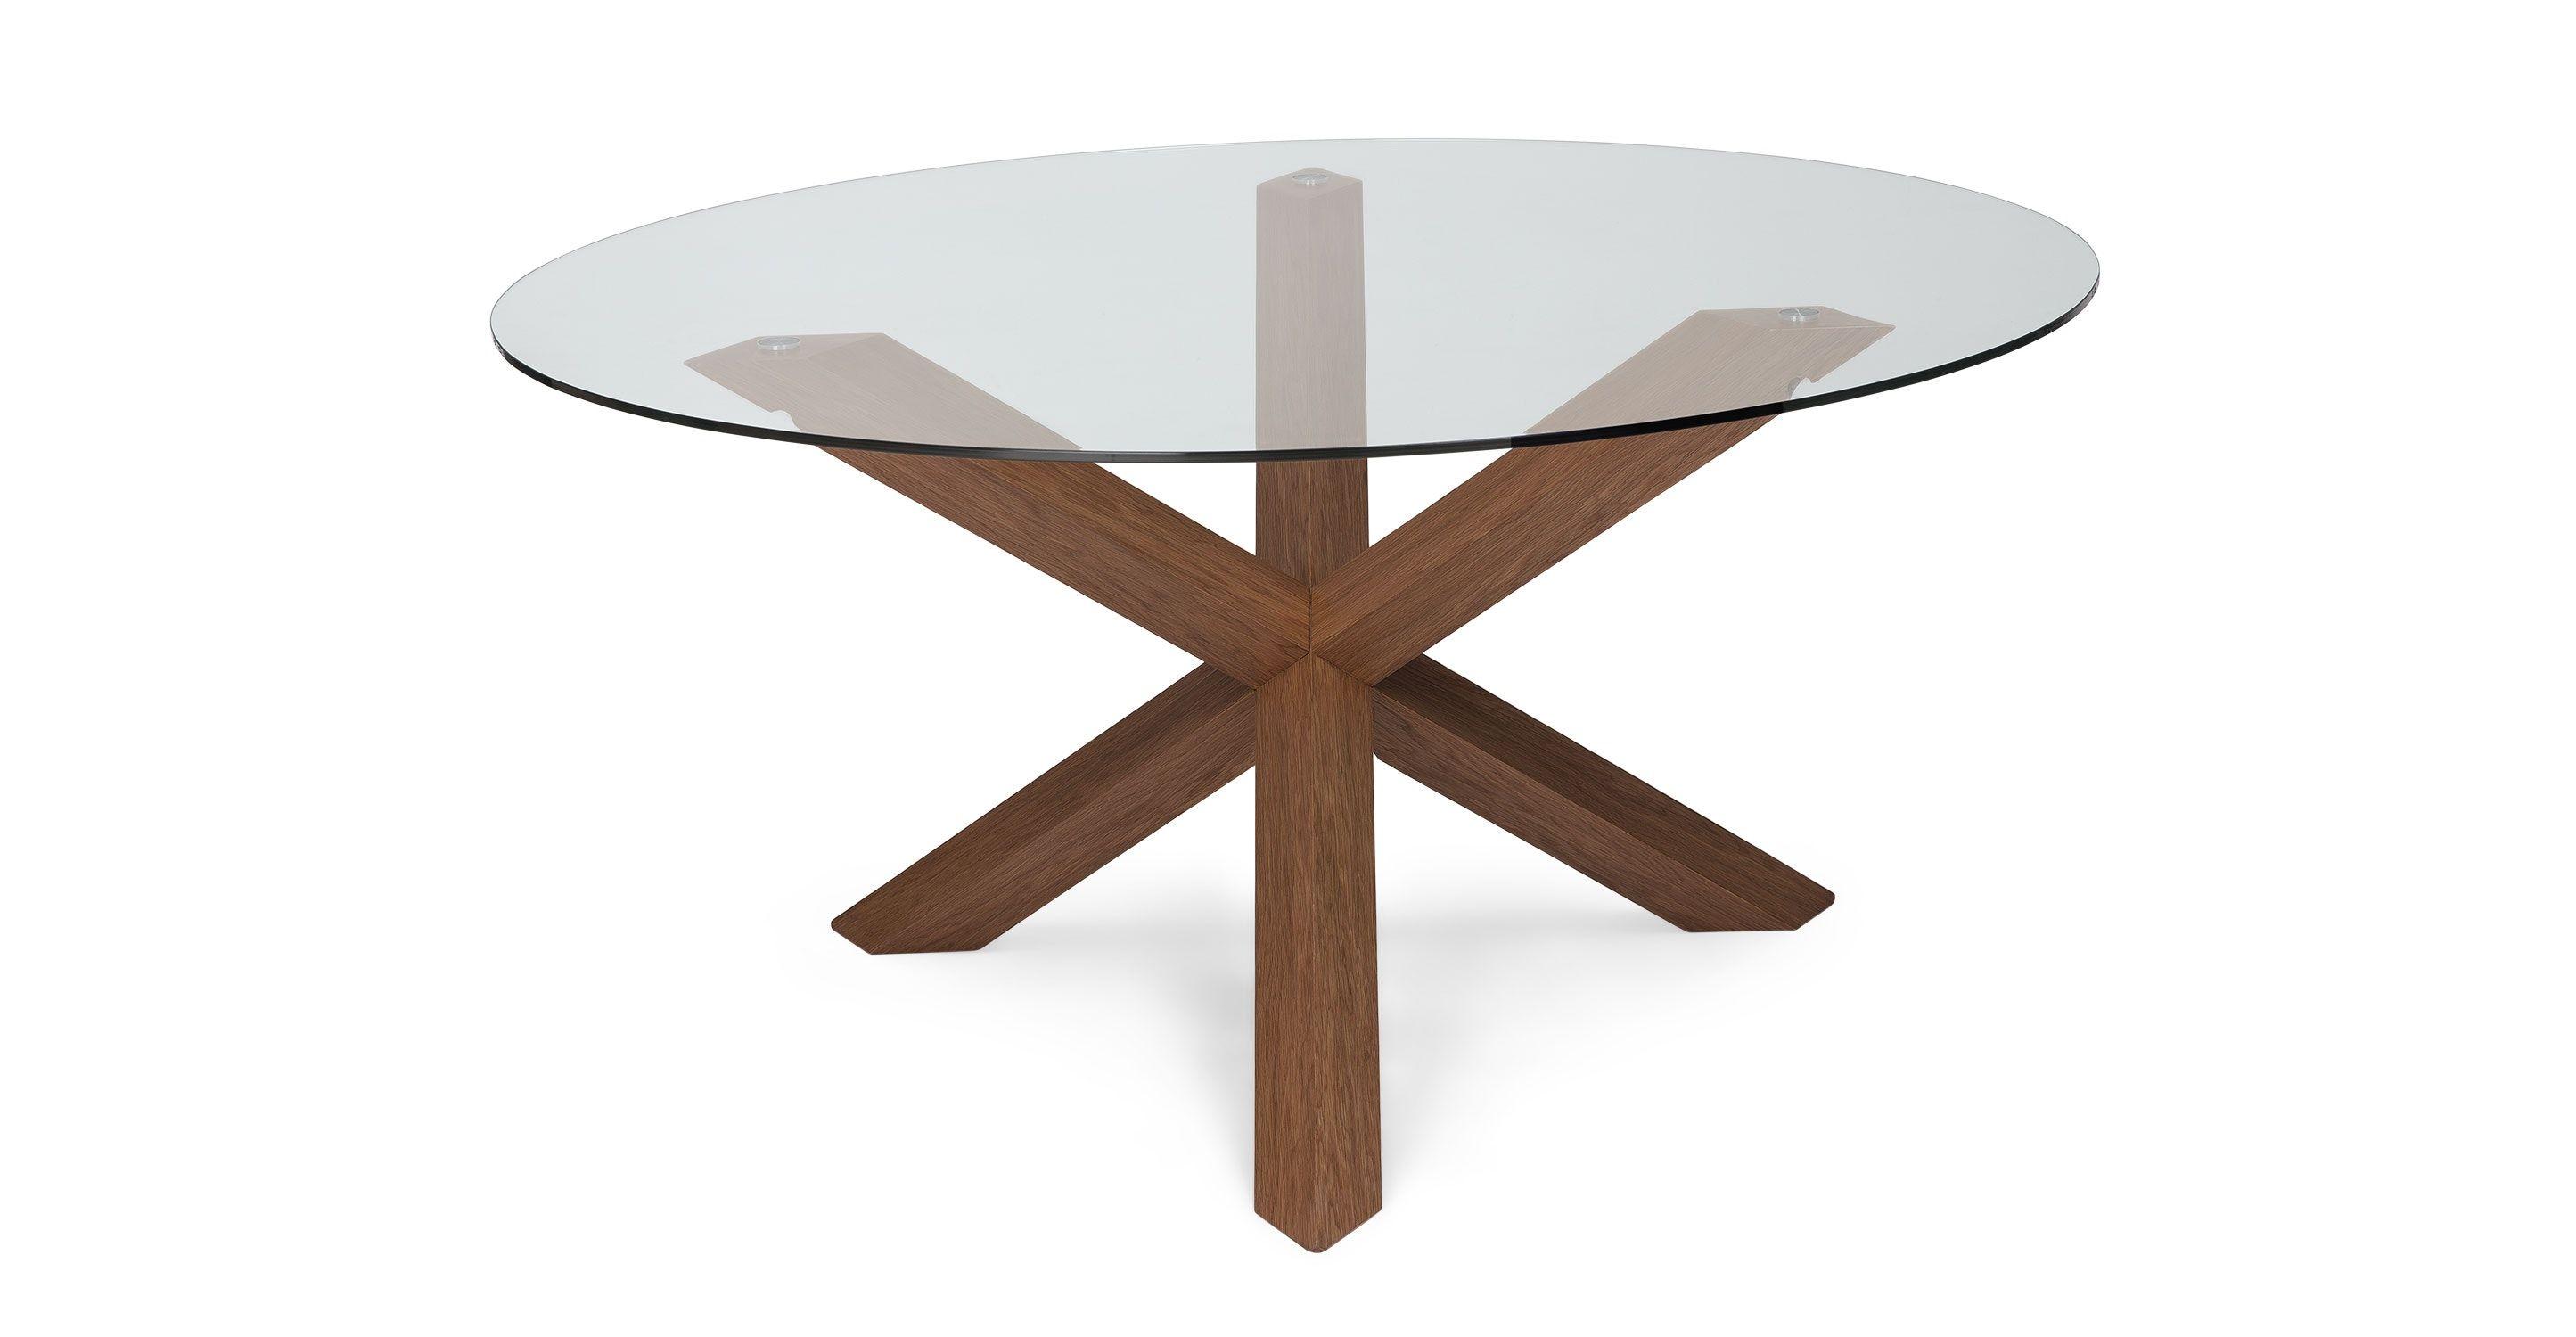 Trina Walnut Dining Table Midcentury Modern Dining Table Glass Round Dining Table Dining Table